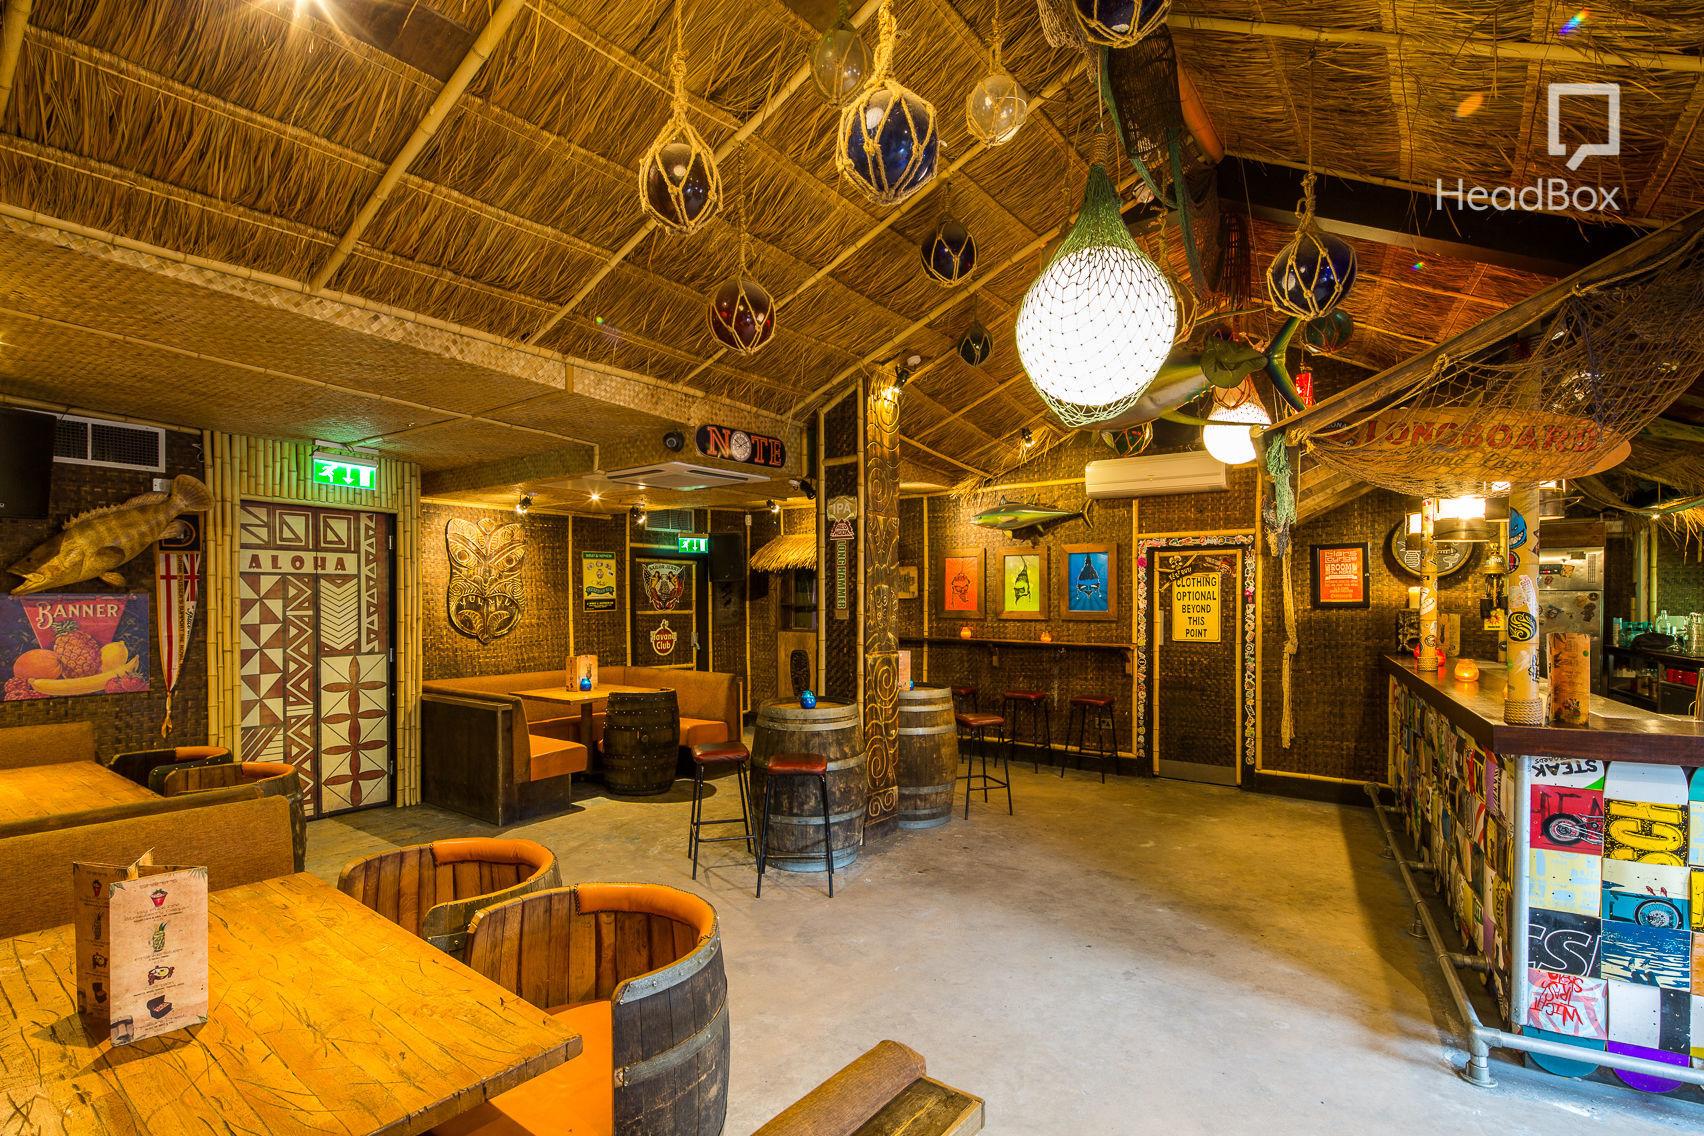 Liar's Lounge, Cane and Grain